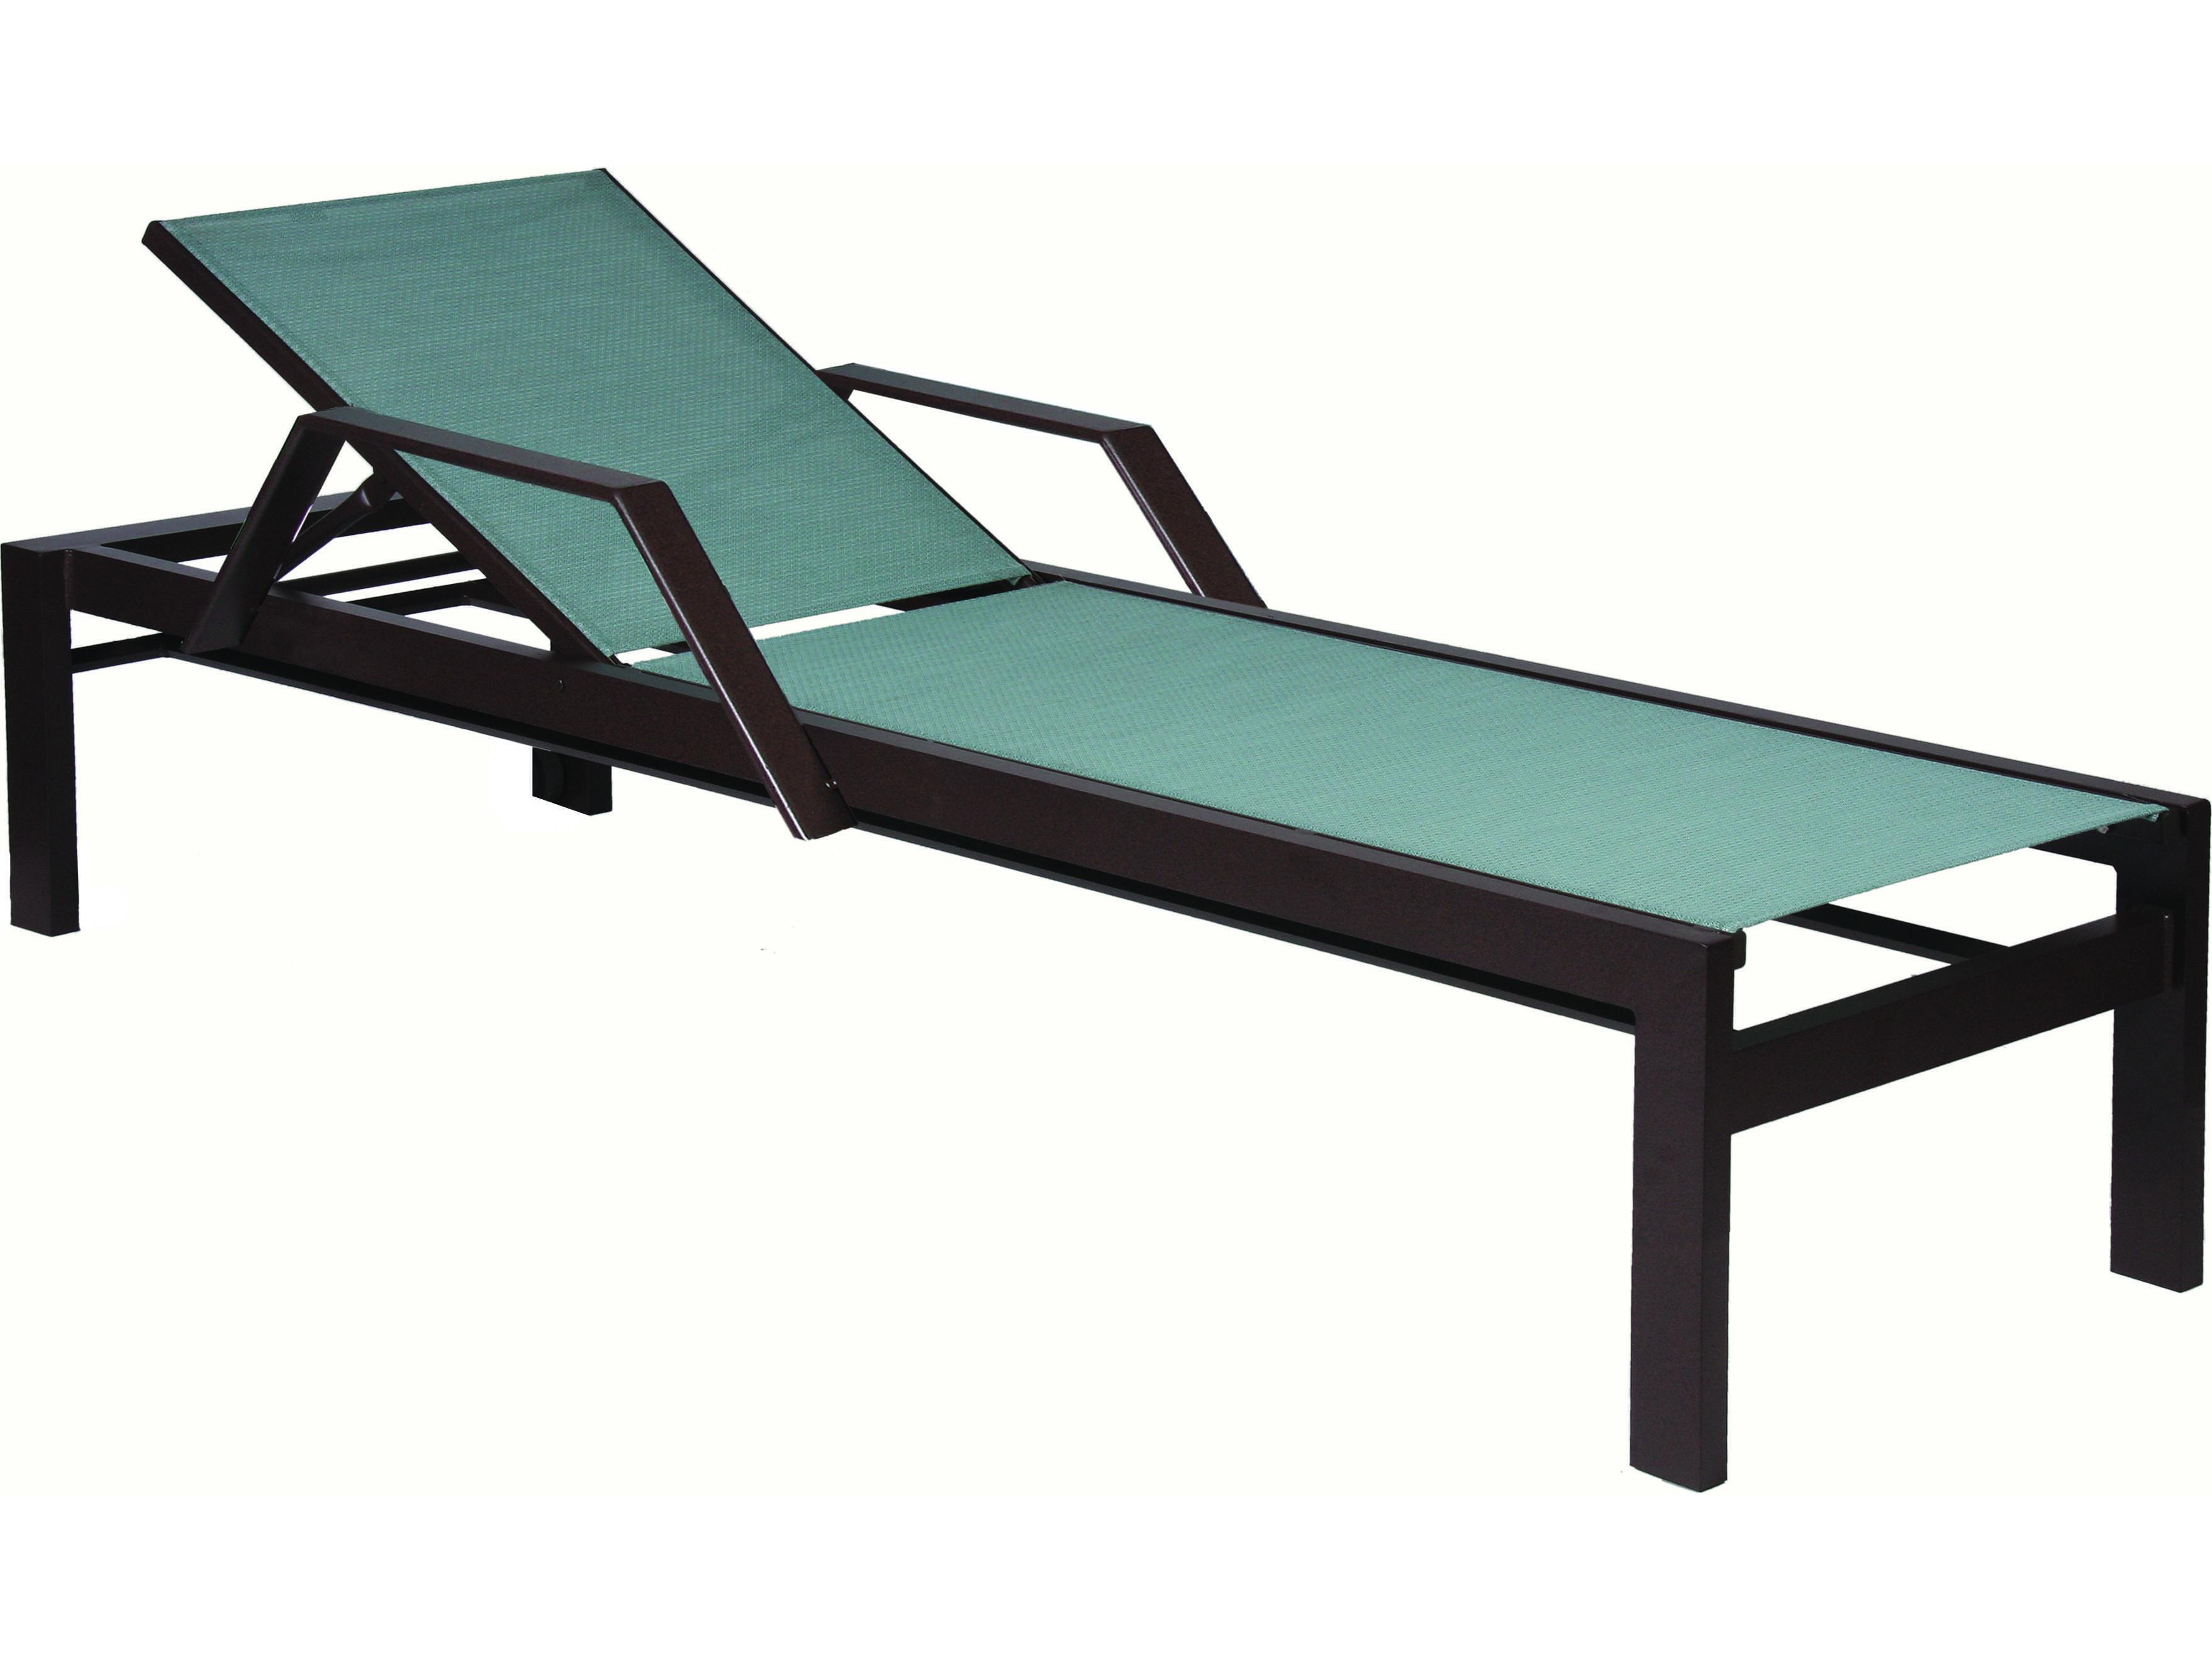 Suncoast vectra bold sling cast aluminum chaise lounge e496 for Aluminum sling chaise lounge